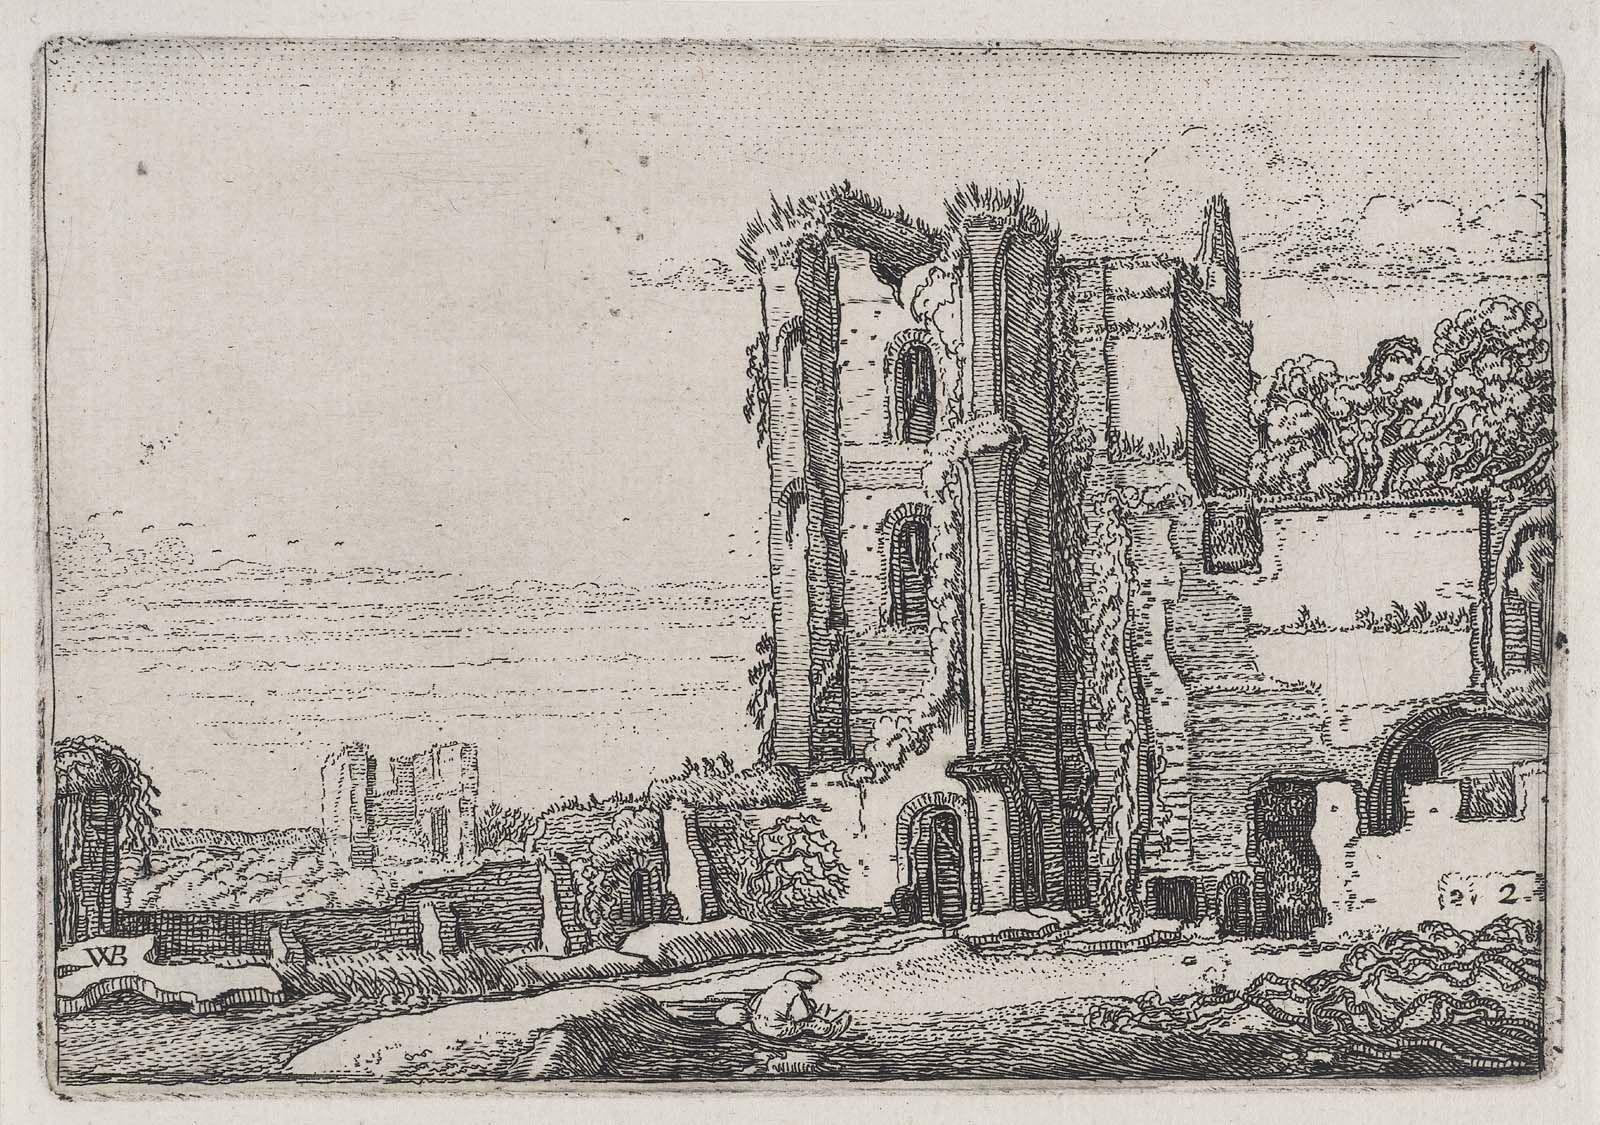 Ruins of Brederode Castle near Haarlem (c. 1616)